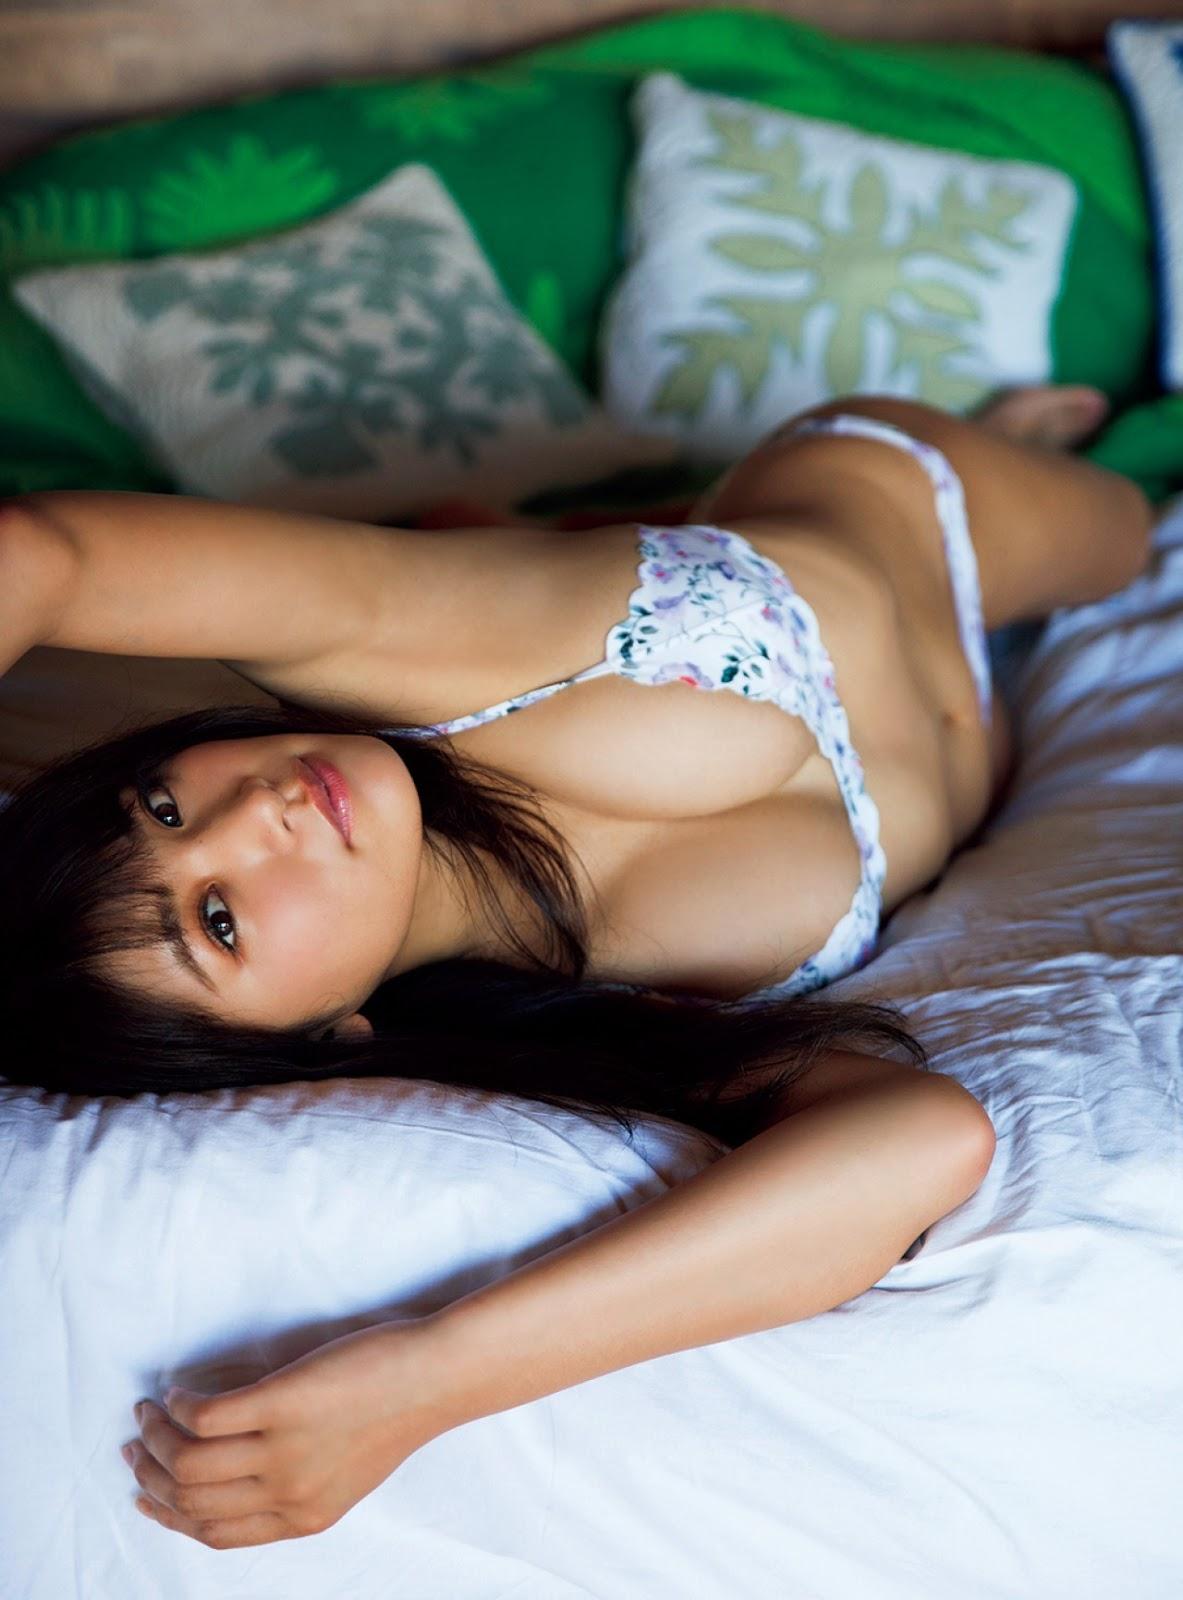 Ikumi Hisamatsu 久松郁実, FRIDAY 2019.02.22 (フライデー 2019年2月22日號) - 亞洲美女 -